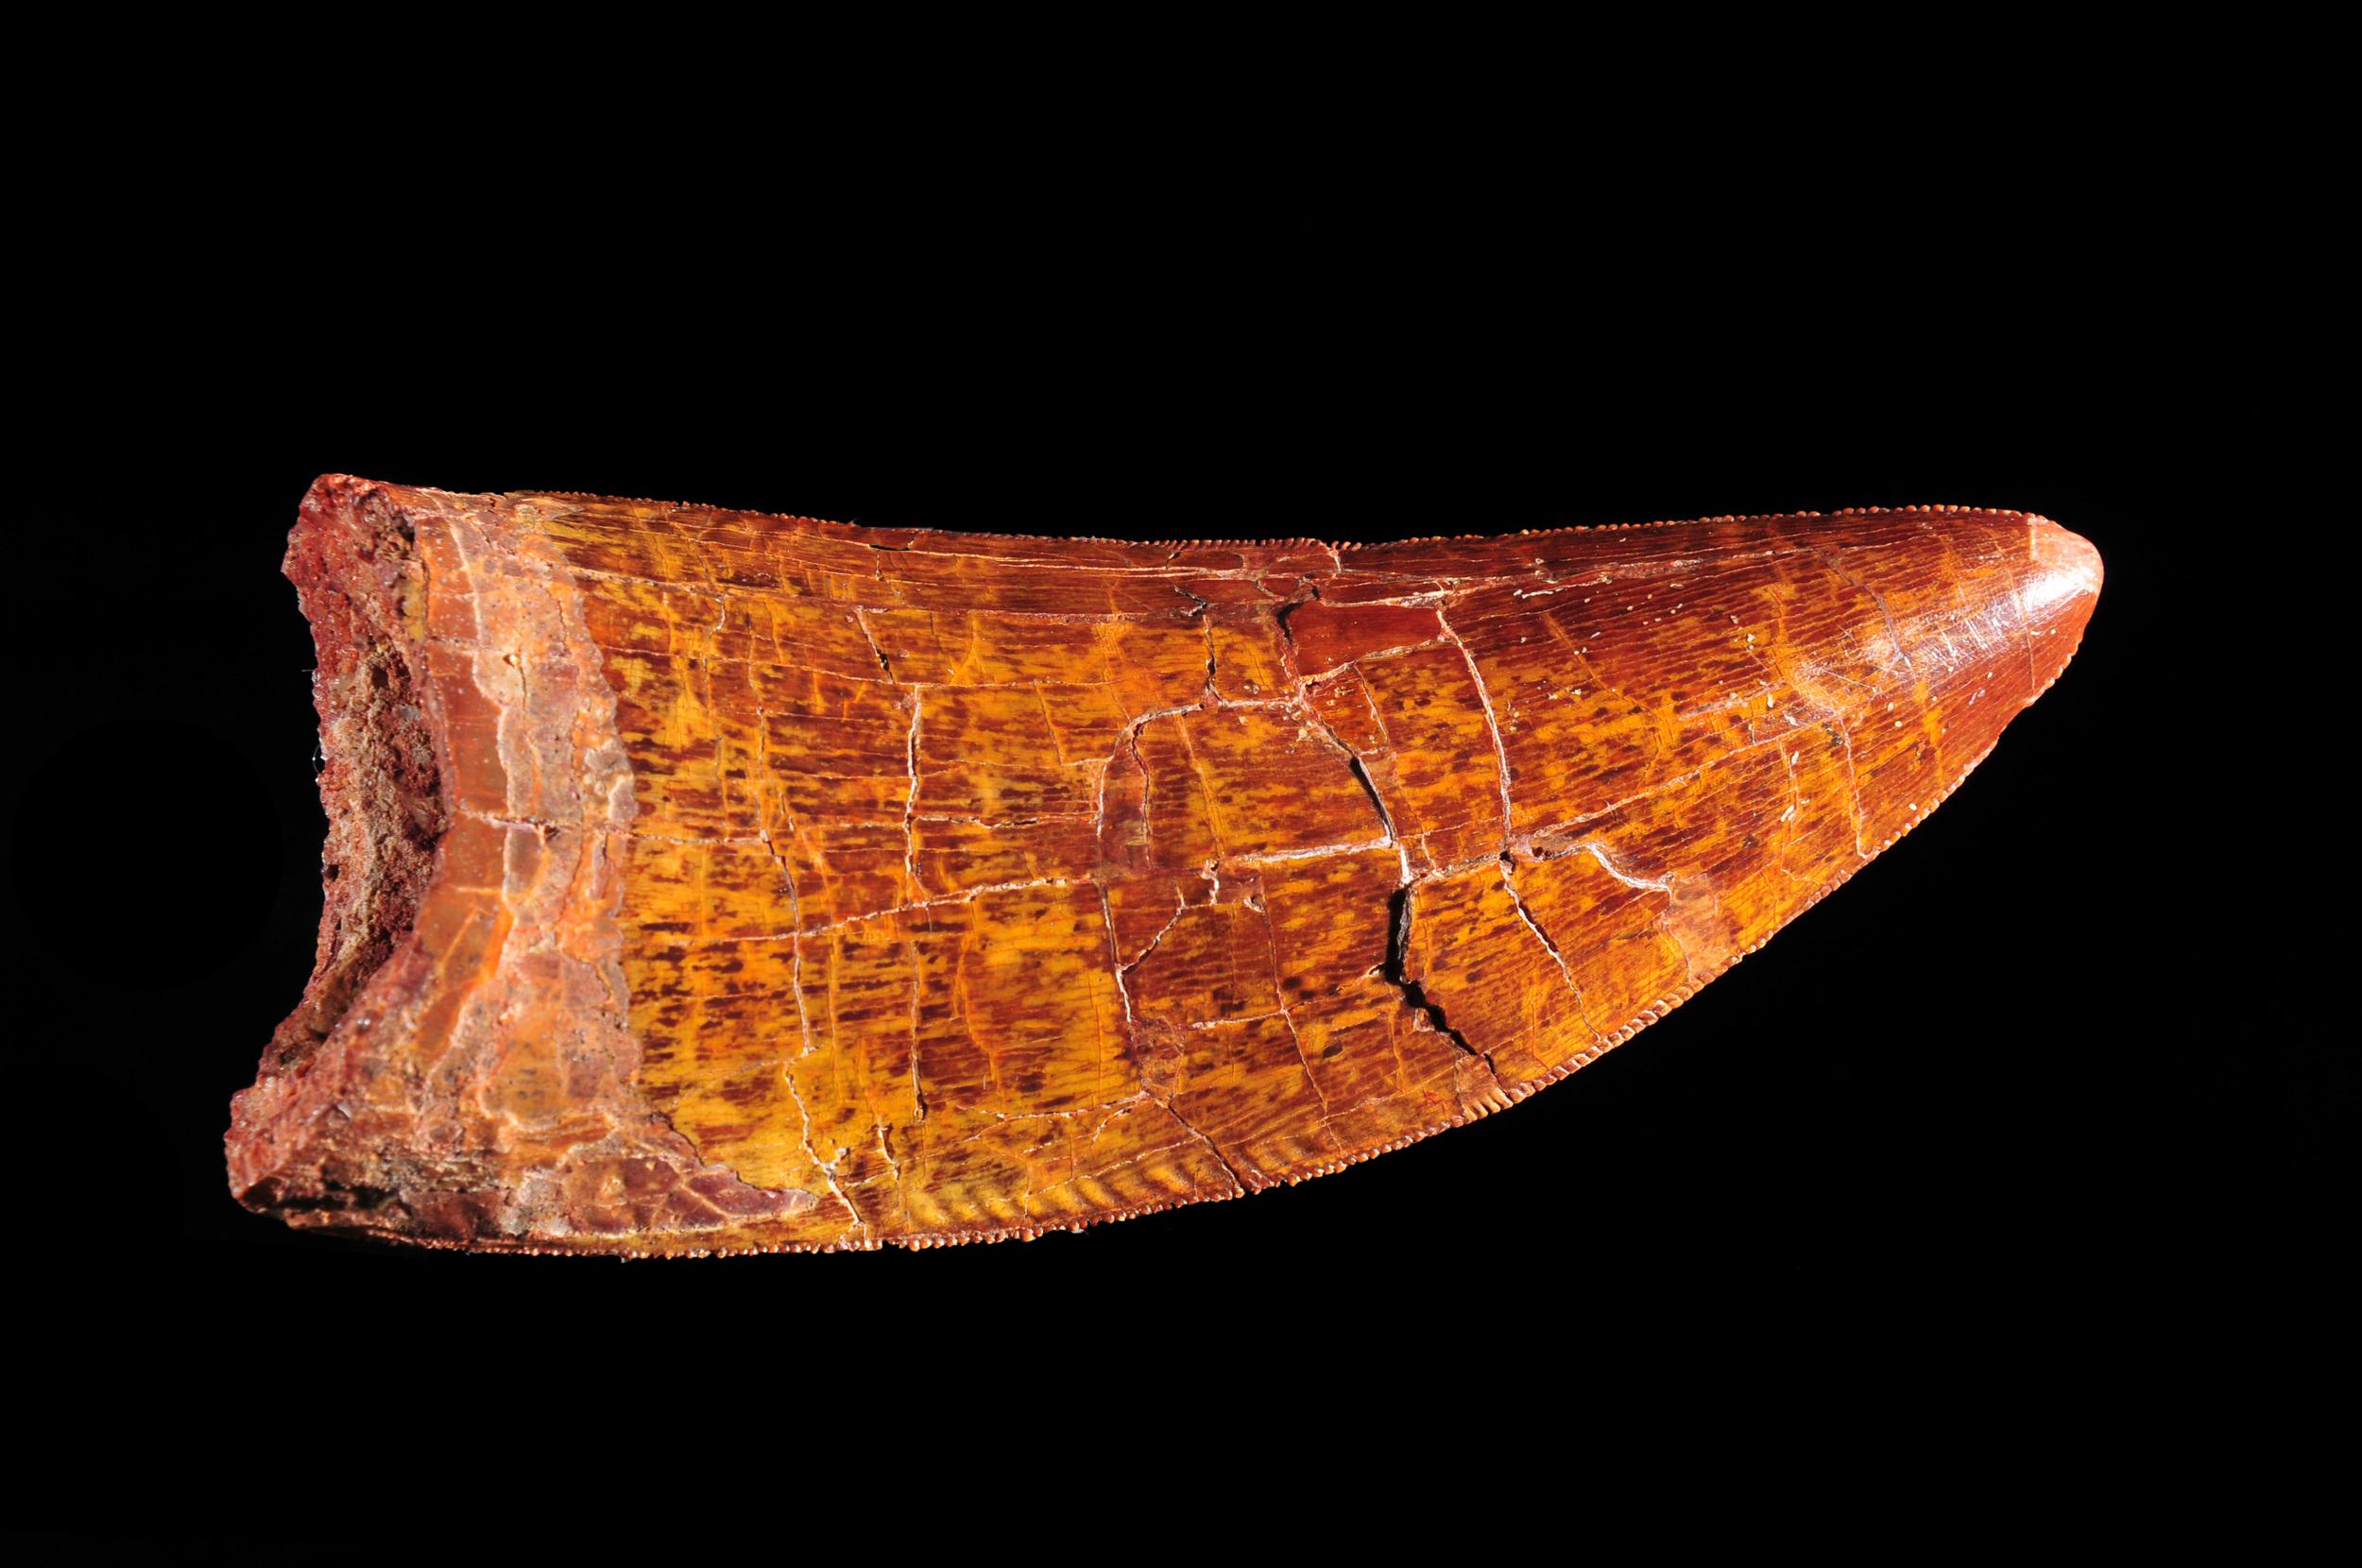 Carcharodontosaurus fossil tooth